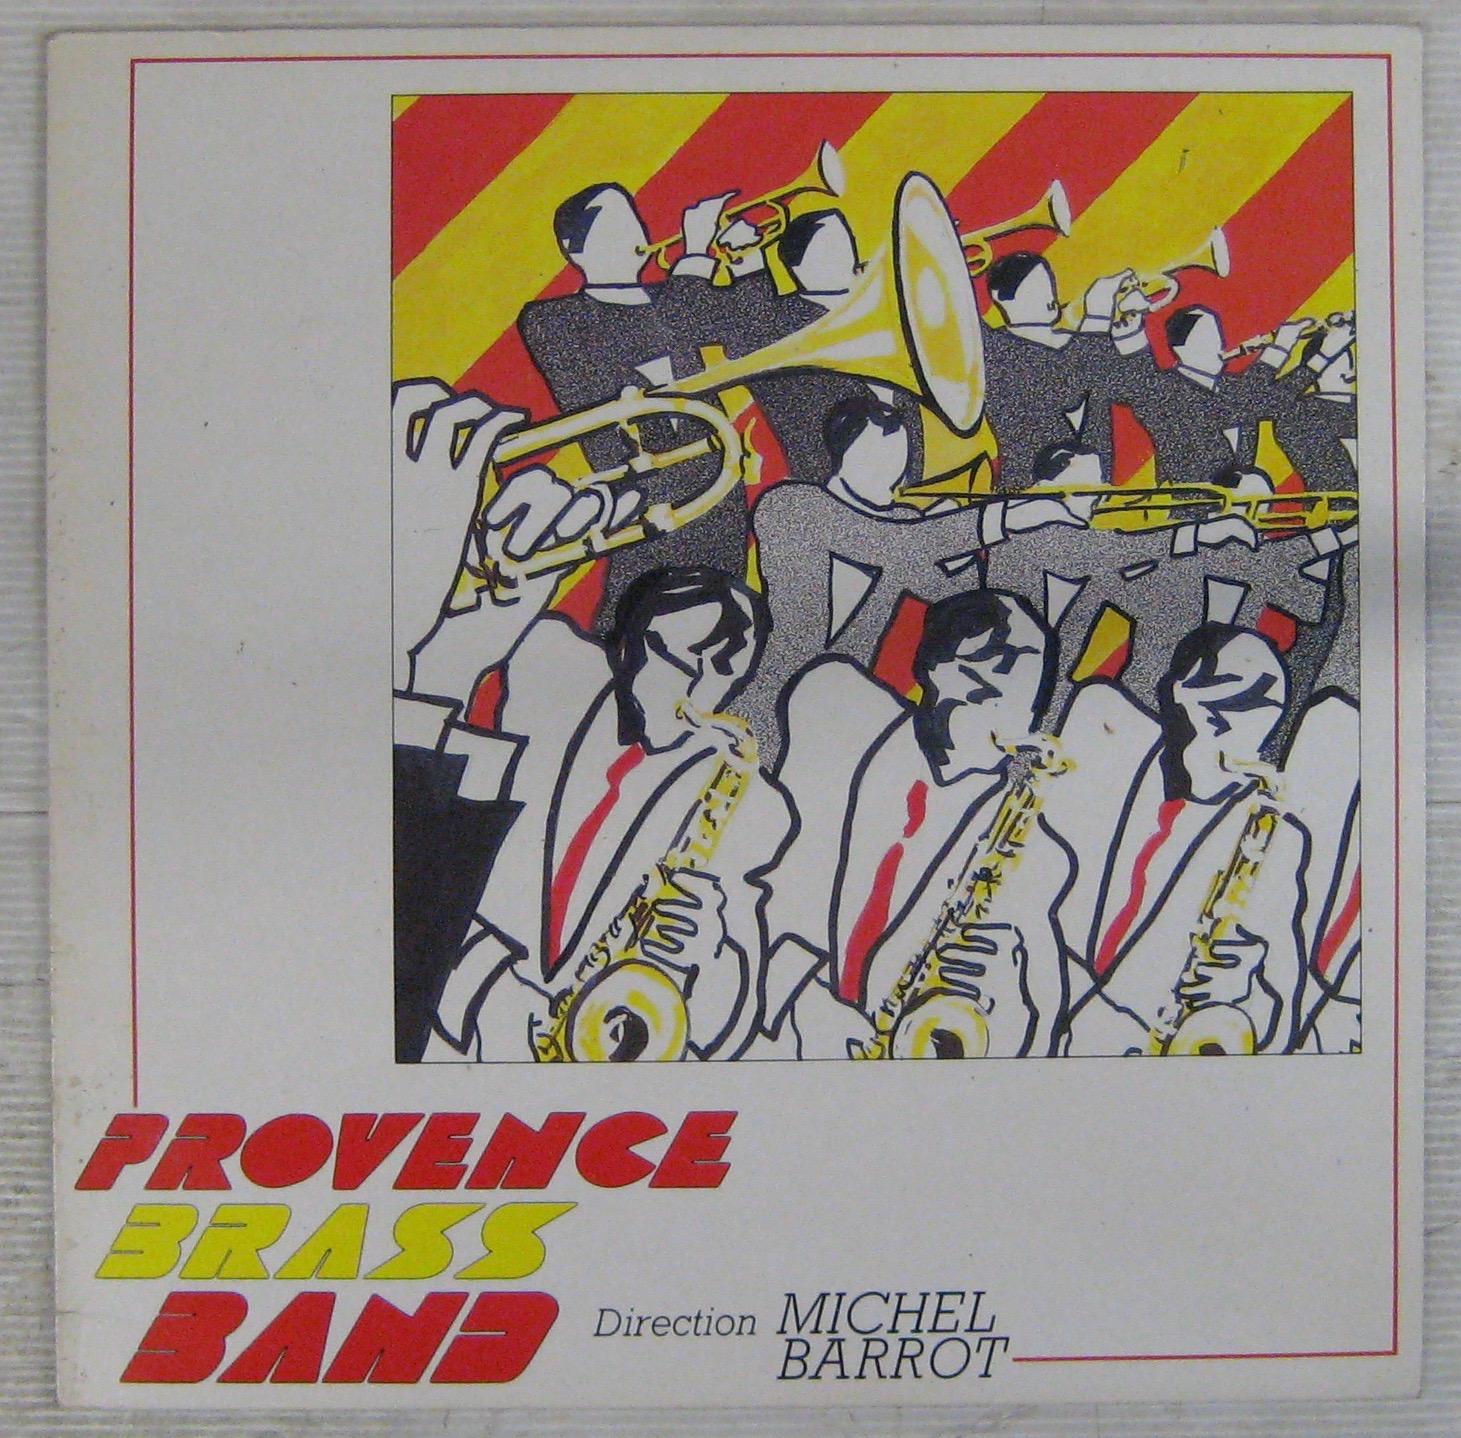 PROVENCE BRASS BAND - Etude 4 - LP